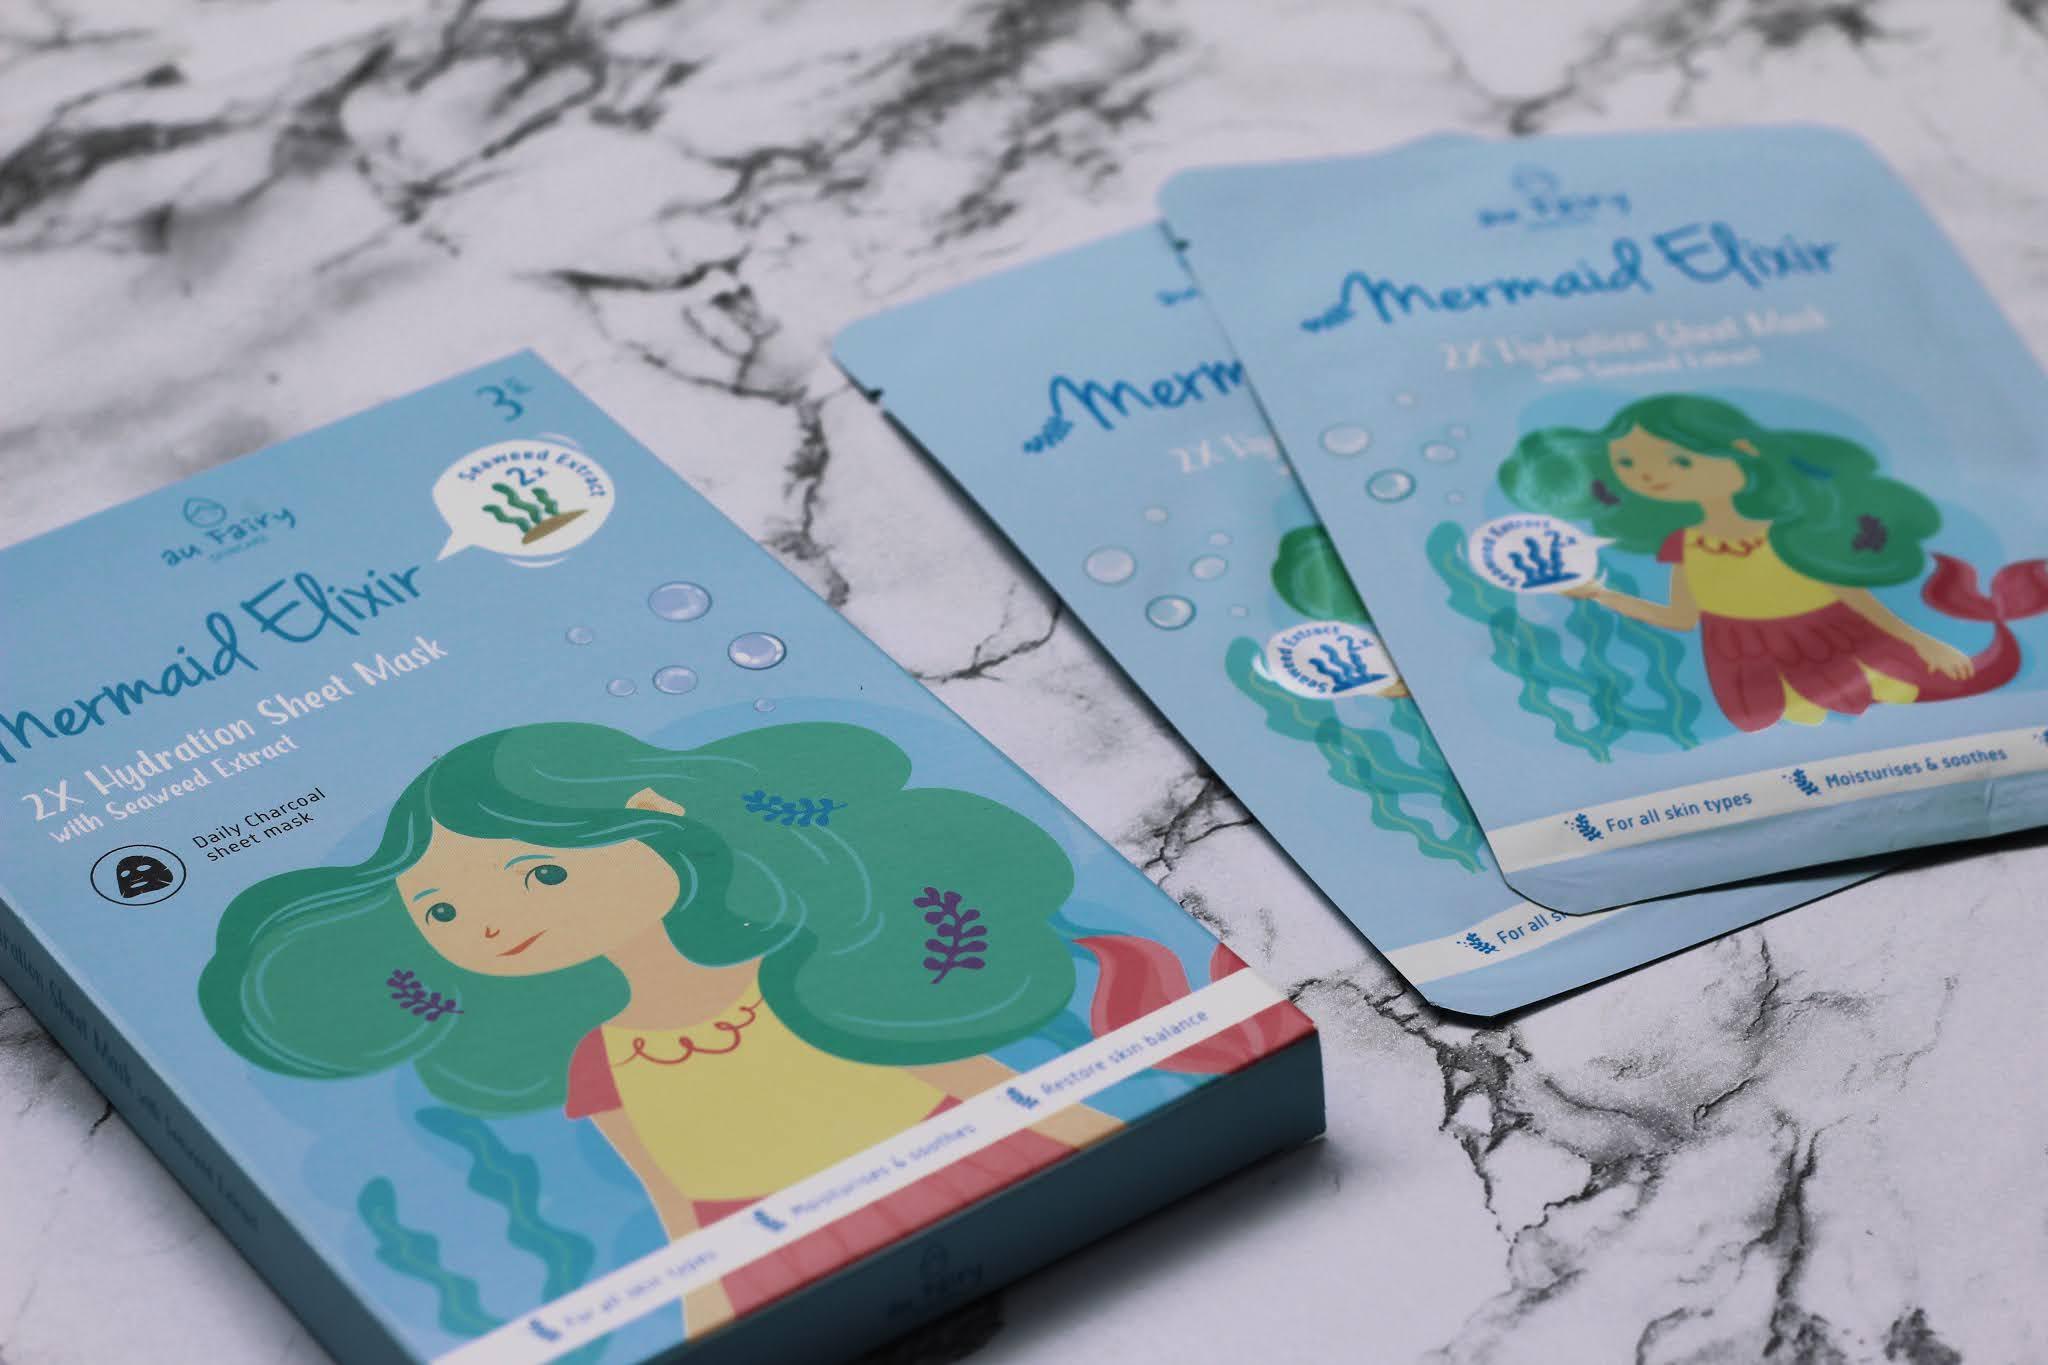 AU Fairy Skincare Mermaid Elixir 2X Hydration Sheet Mask with Seaweed Extract